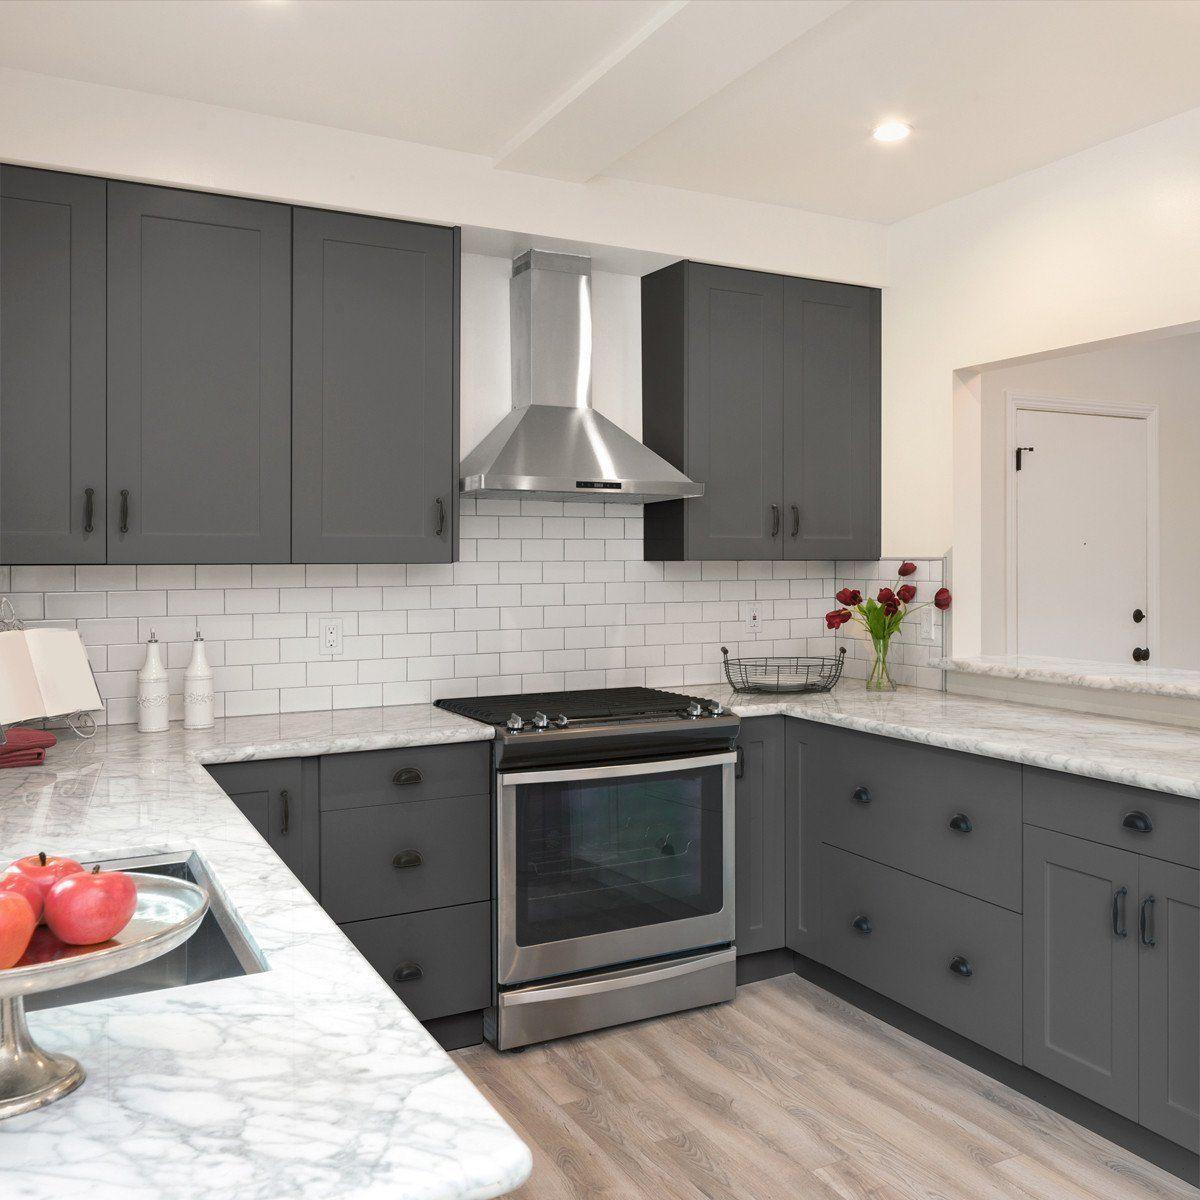 Best Nuvo Earl Grey Cabinet Paint Kit Decoración De Cocina 400 x 300